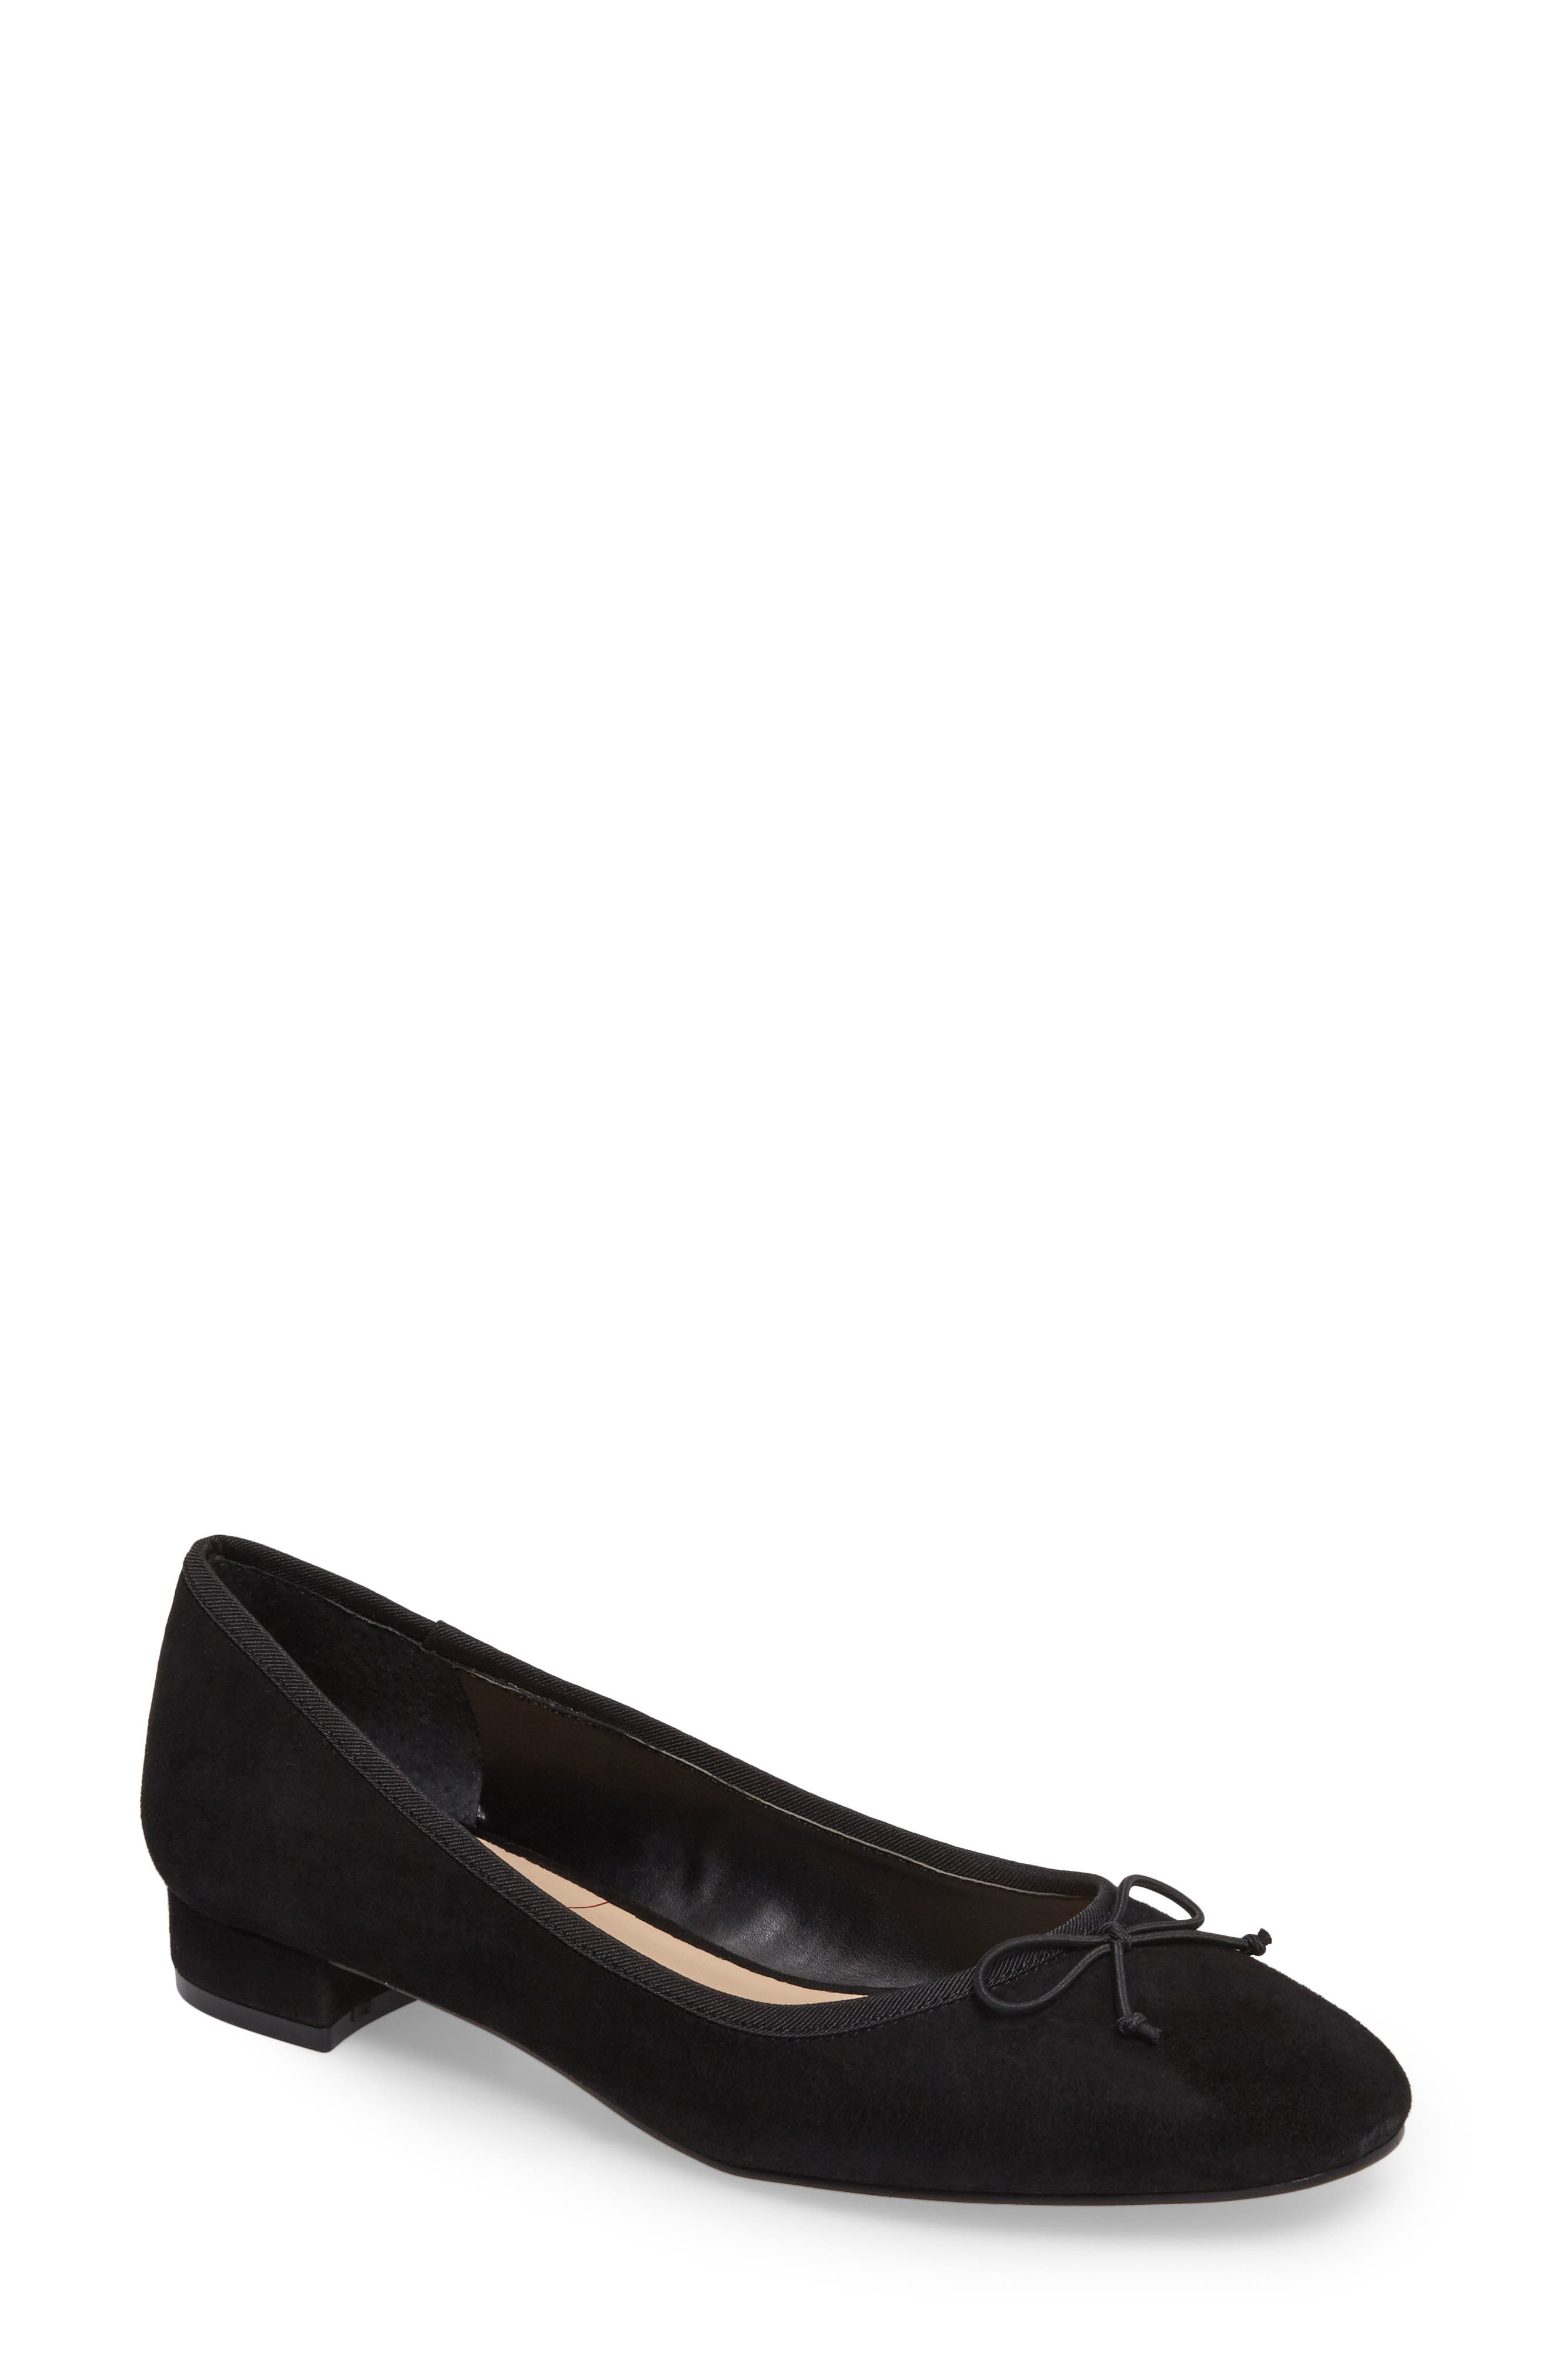 Anastasi Block Heel Flat,                         Main,                         color, Black Suede